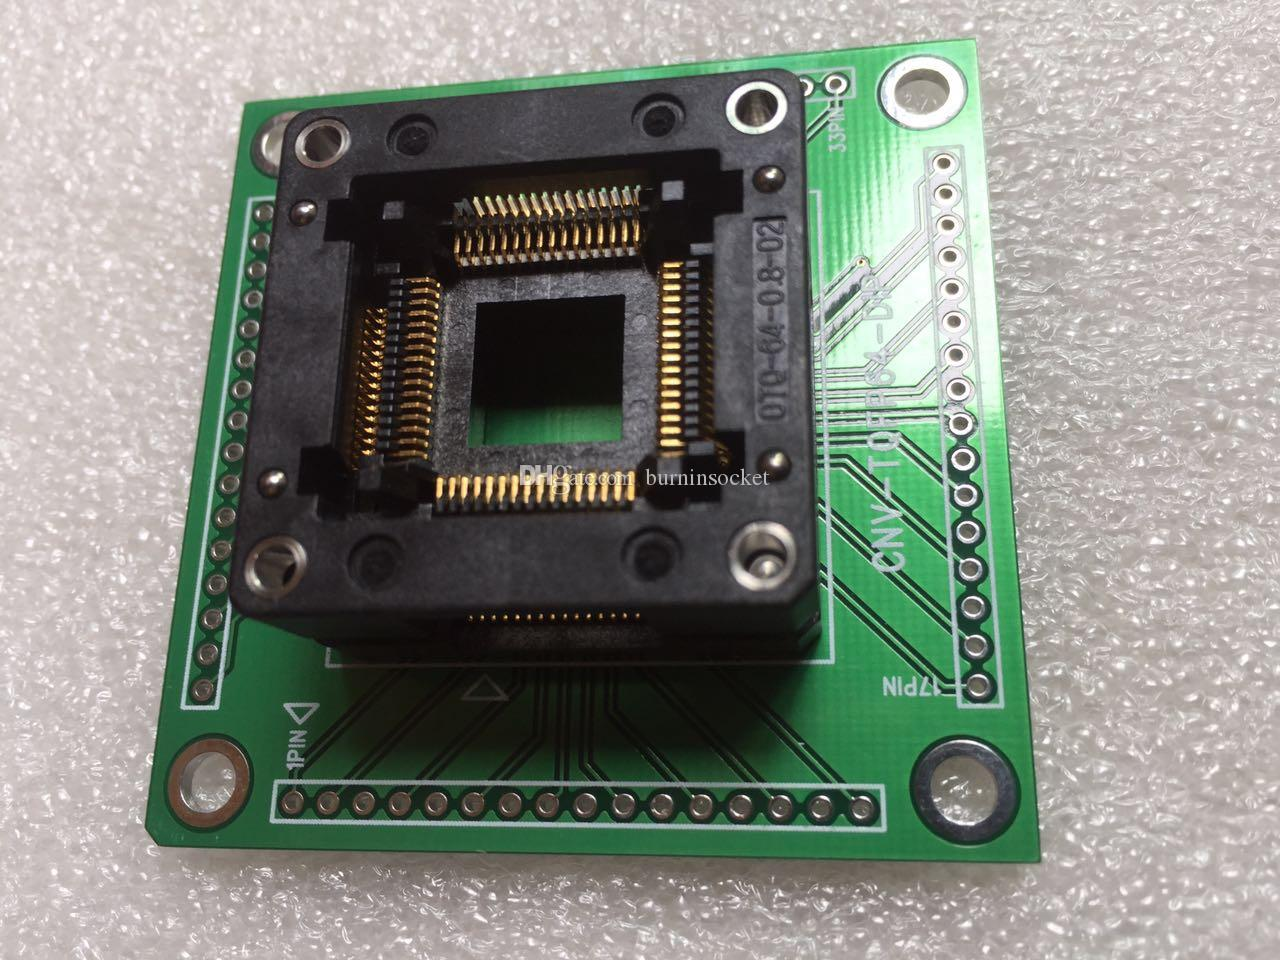 Enplas ic test socket OTQ-64-0.8-02 with pcb board CNV-TQFP64-DIP QFP64PIN 0.8MM pitch burn in socket